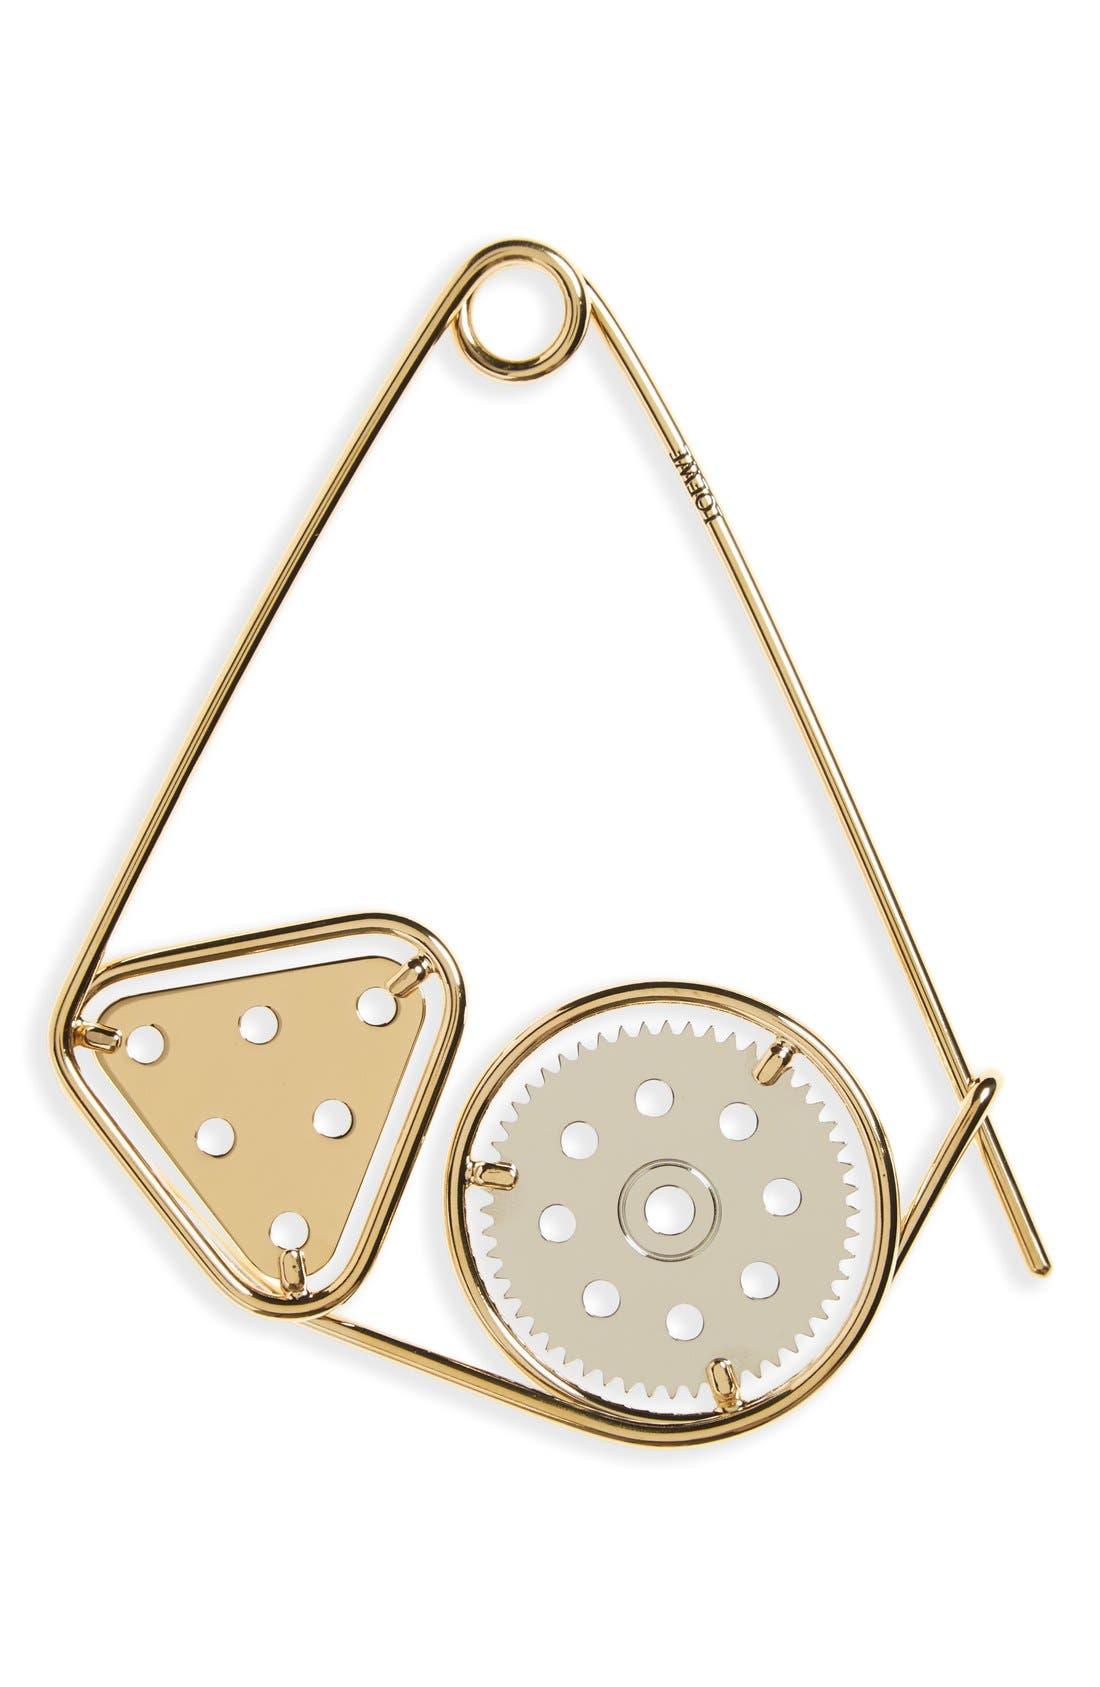 Loewe 'Meccano' Double Pin Bag Charm